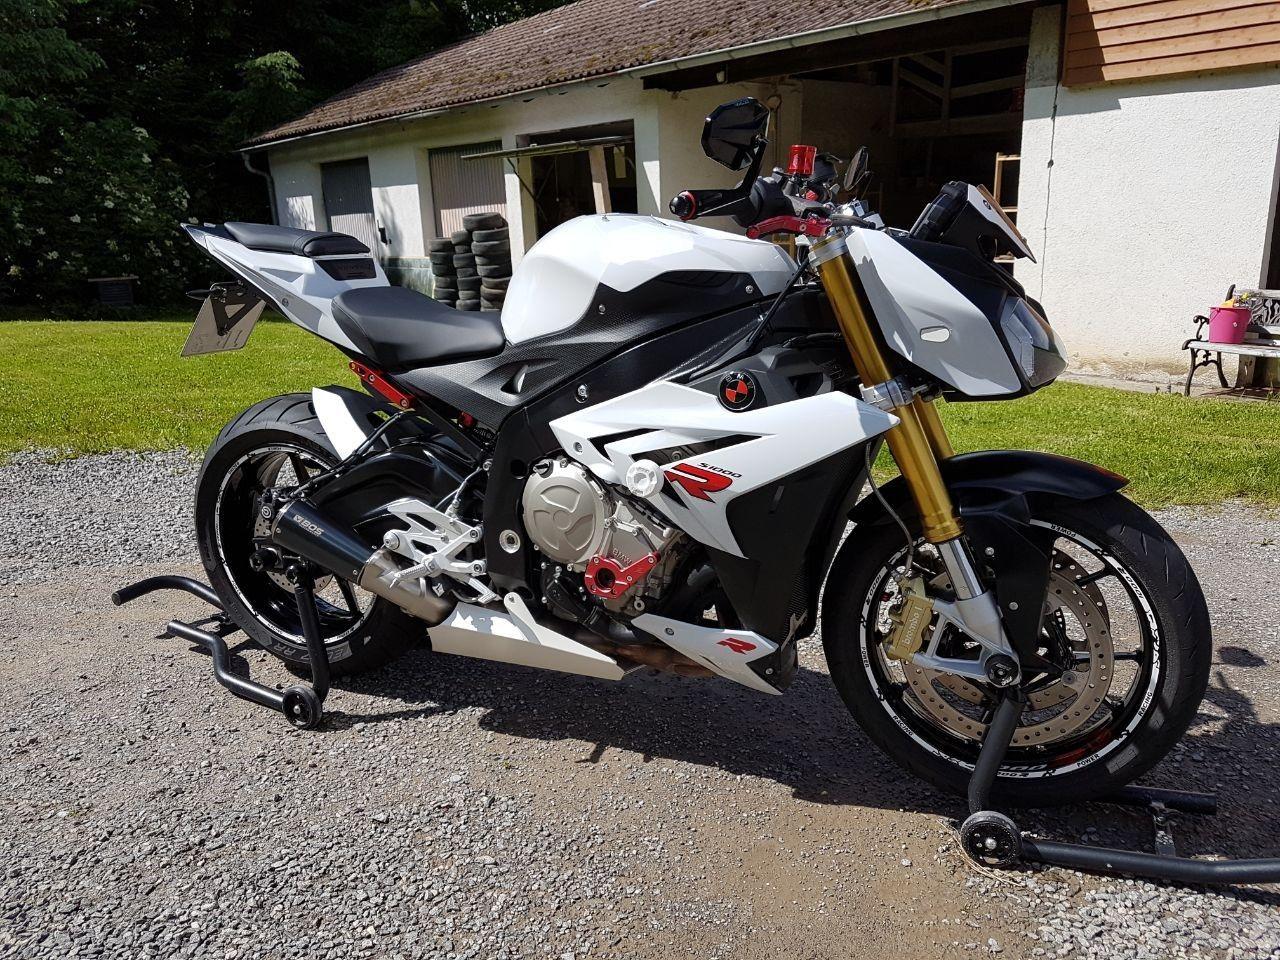 Ingo S Babe Bmwmotorrad Makelifearide S1000r Bmw Motorrad Bmw Motorcycle